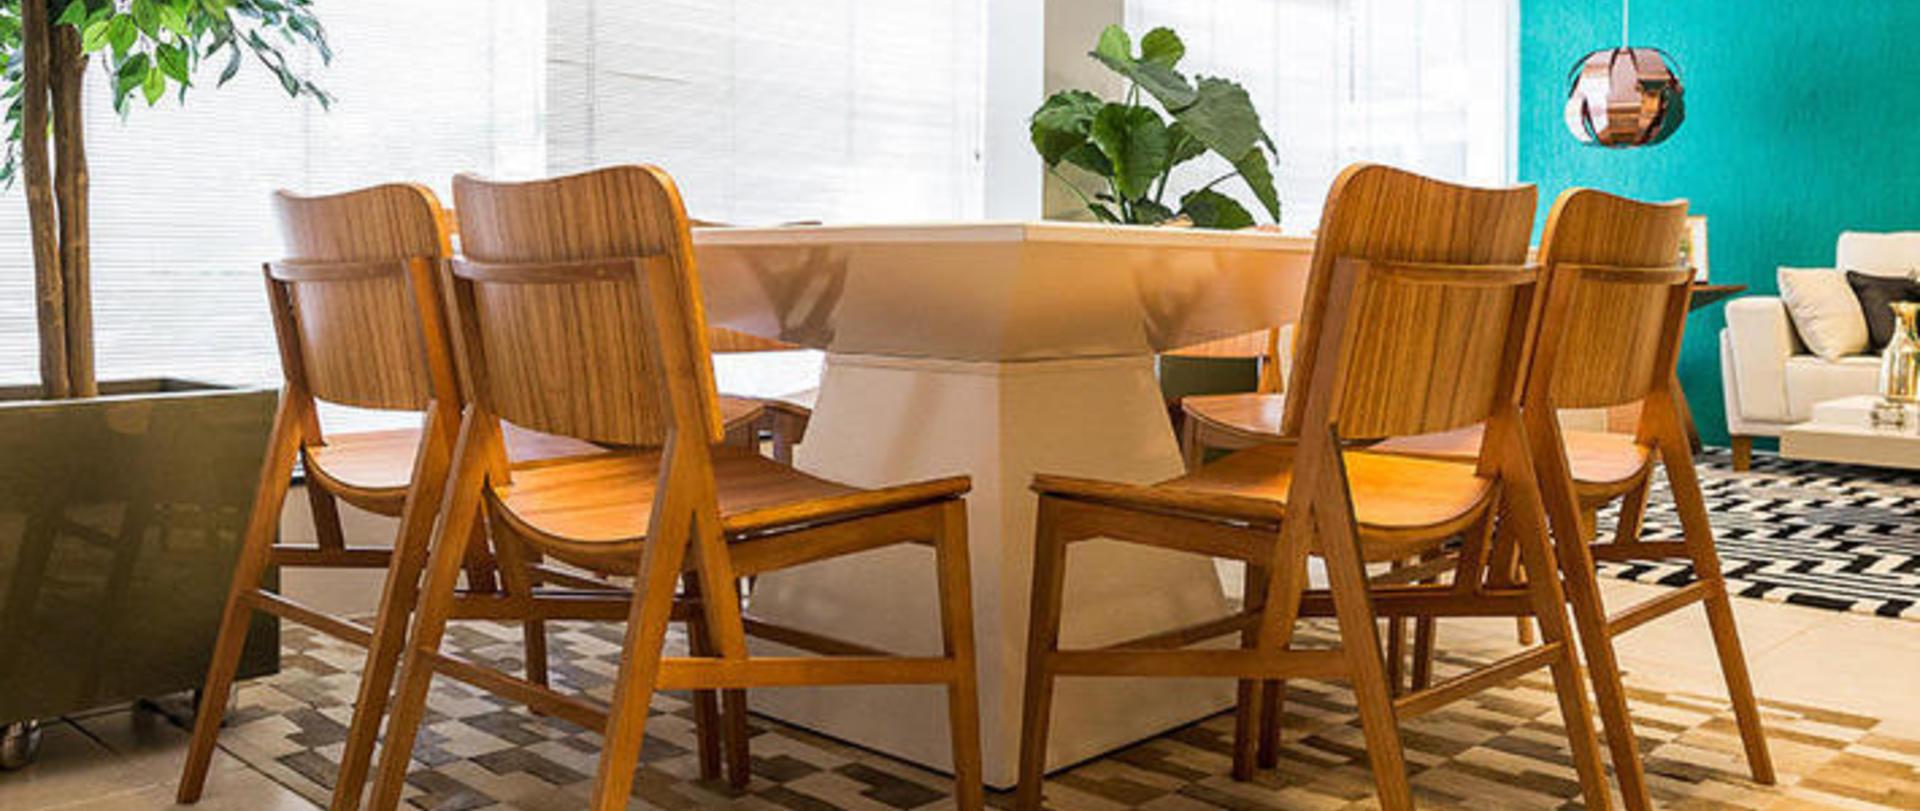 Sala De Jantar Usada Sp ~ Sala de jantar, Loja de Móveis Masotti